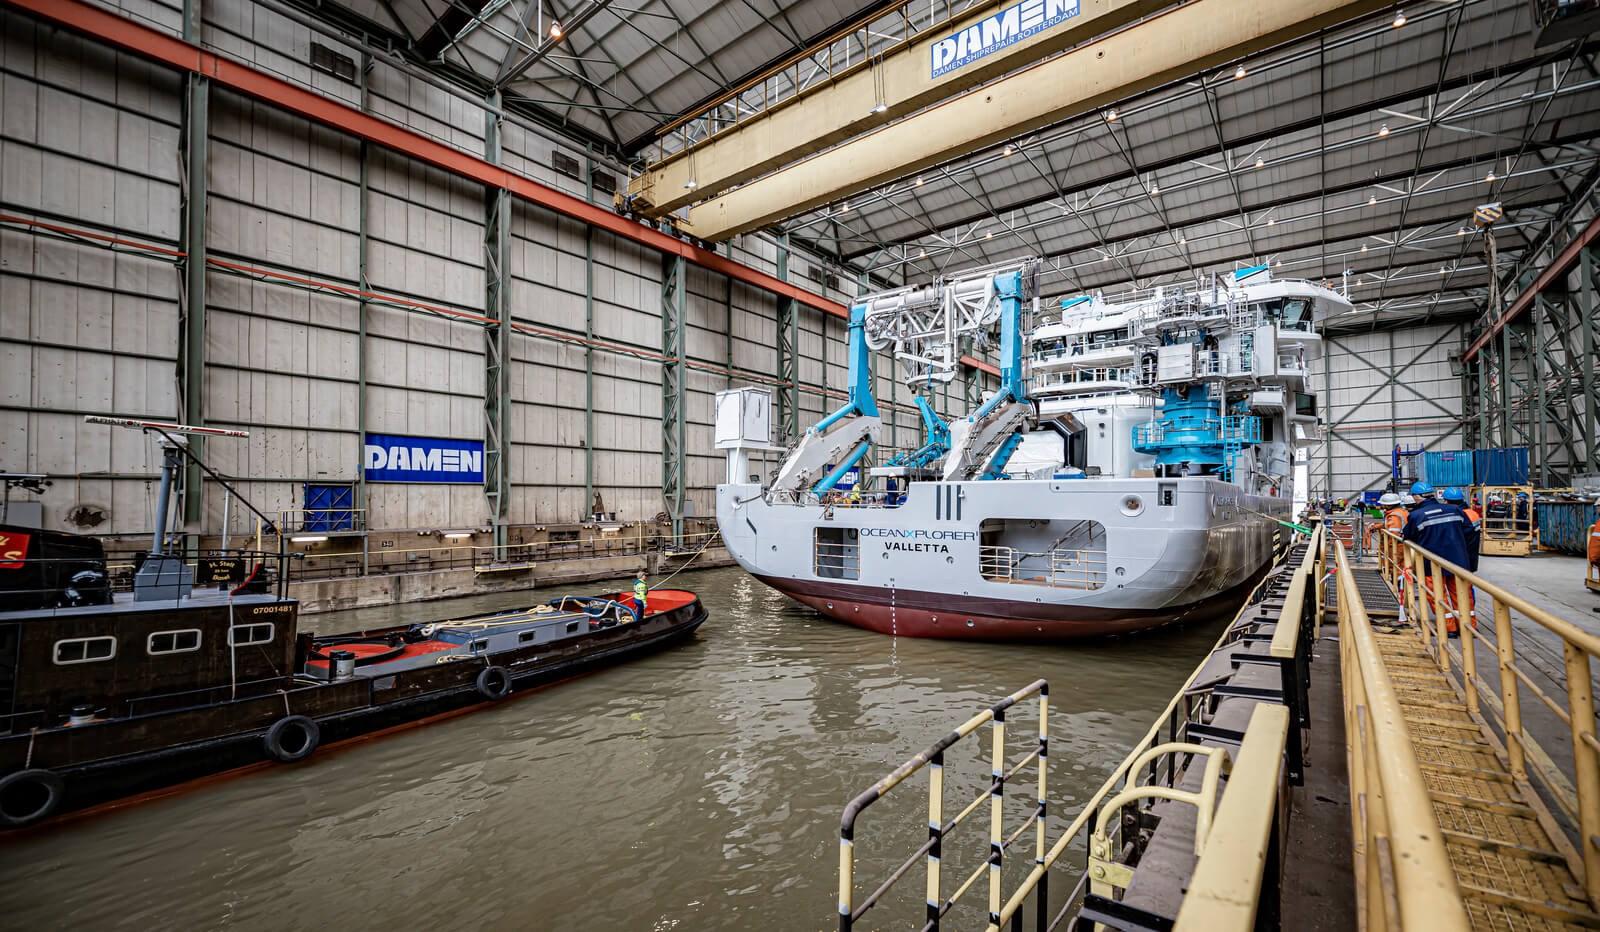 Damen completes rebuild of cutting-edge research vessel OceanXplorer